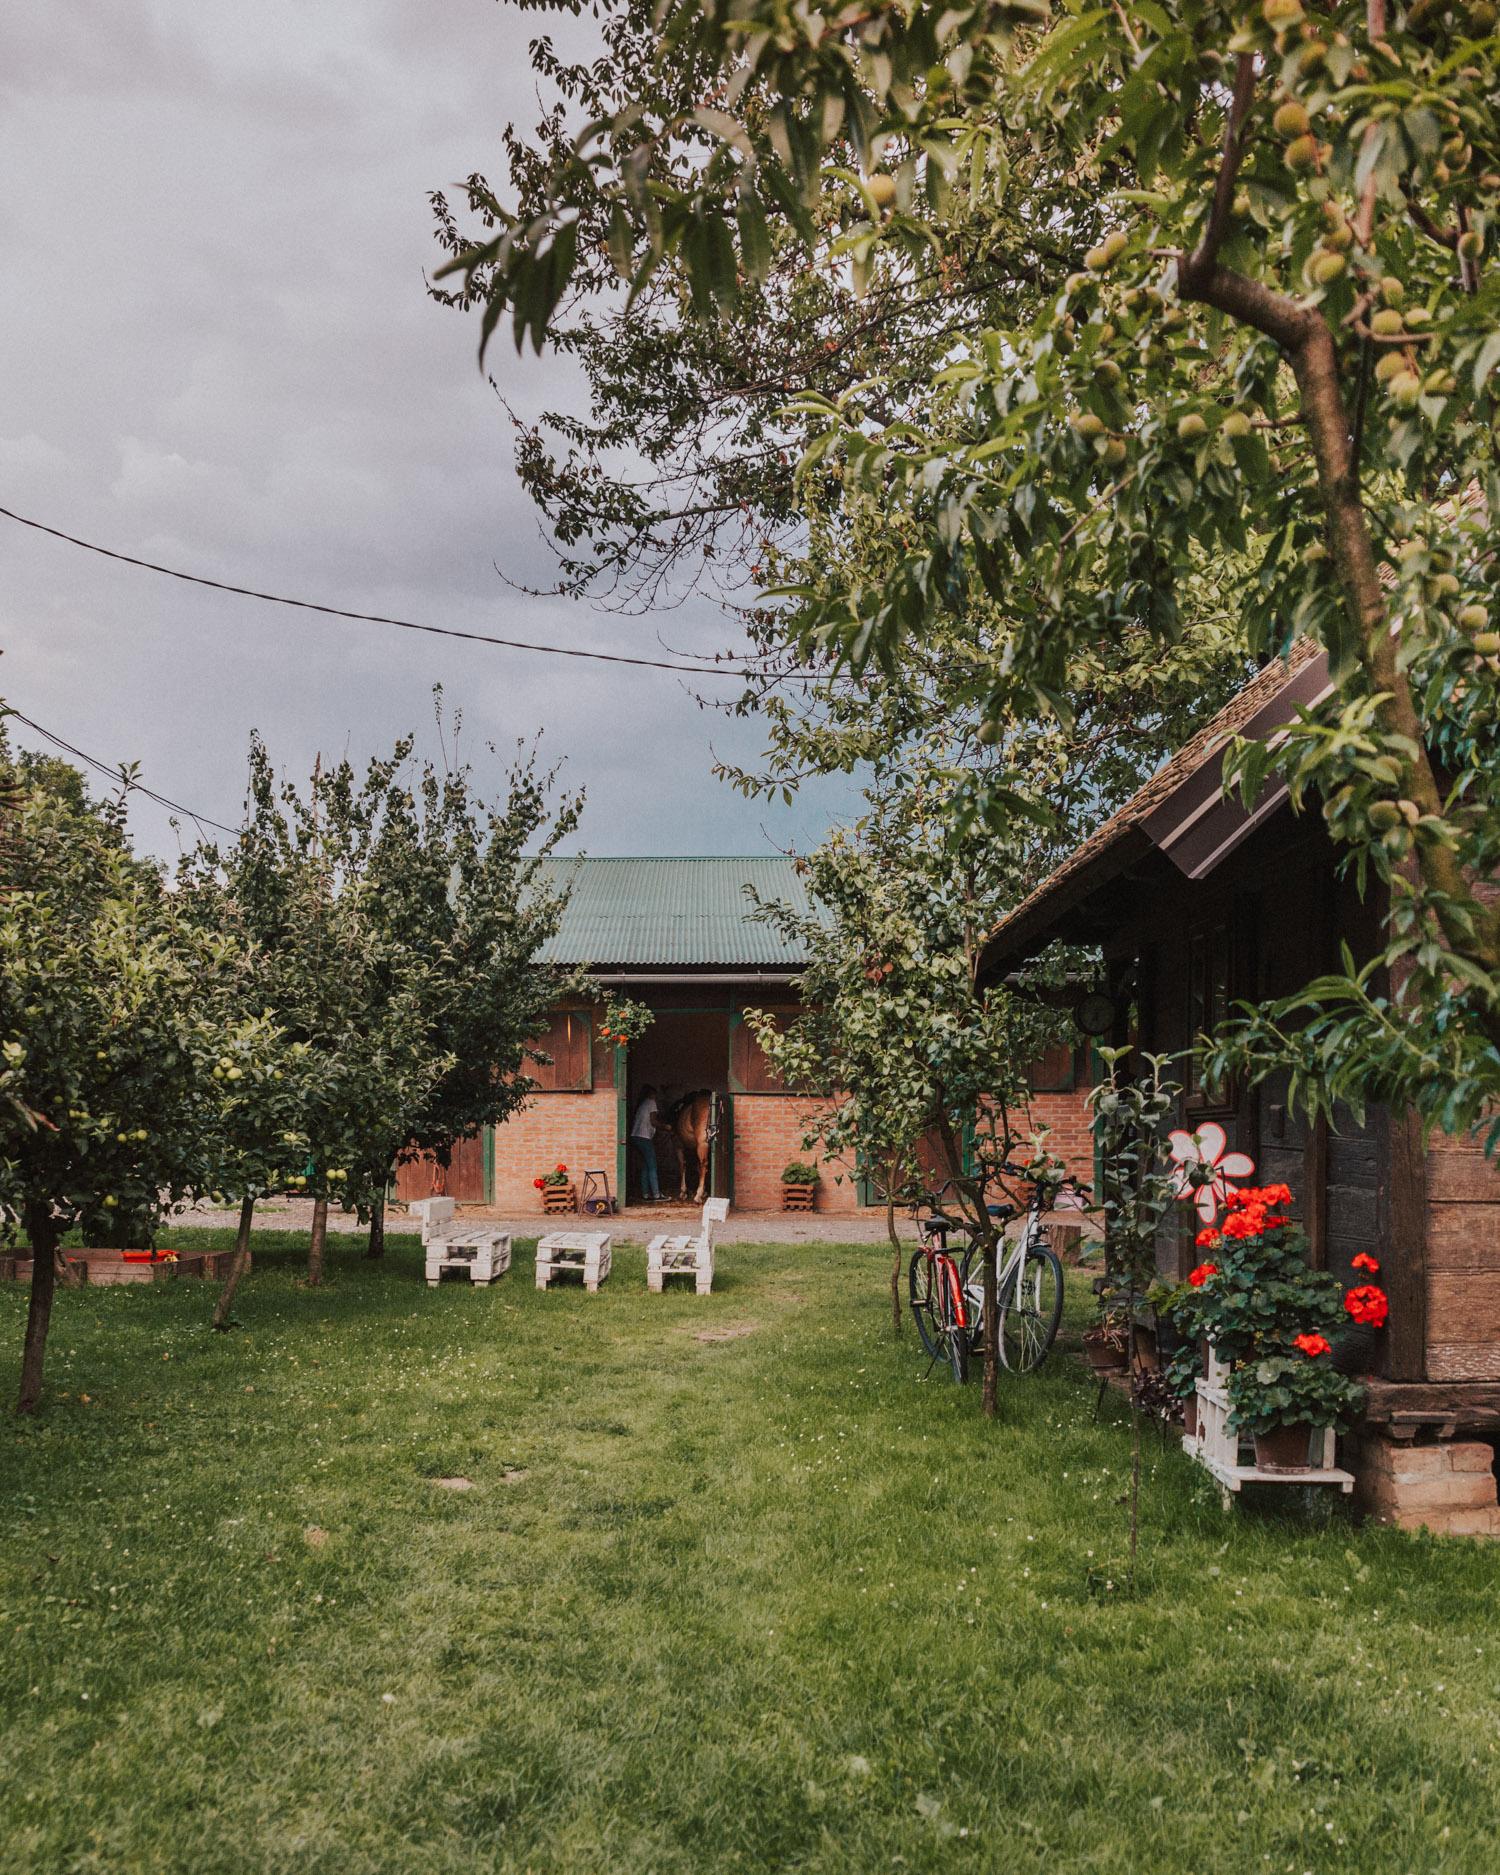 Konjički Klub Eohippus | Things to do in Slavonia